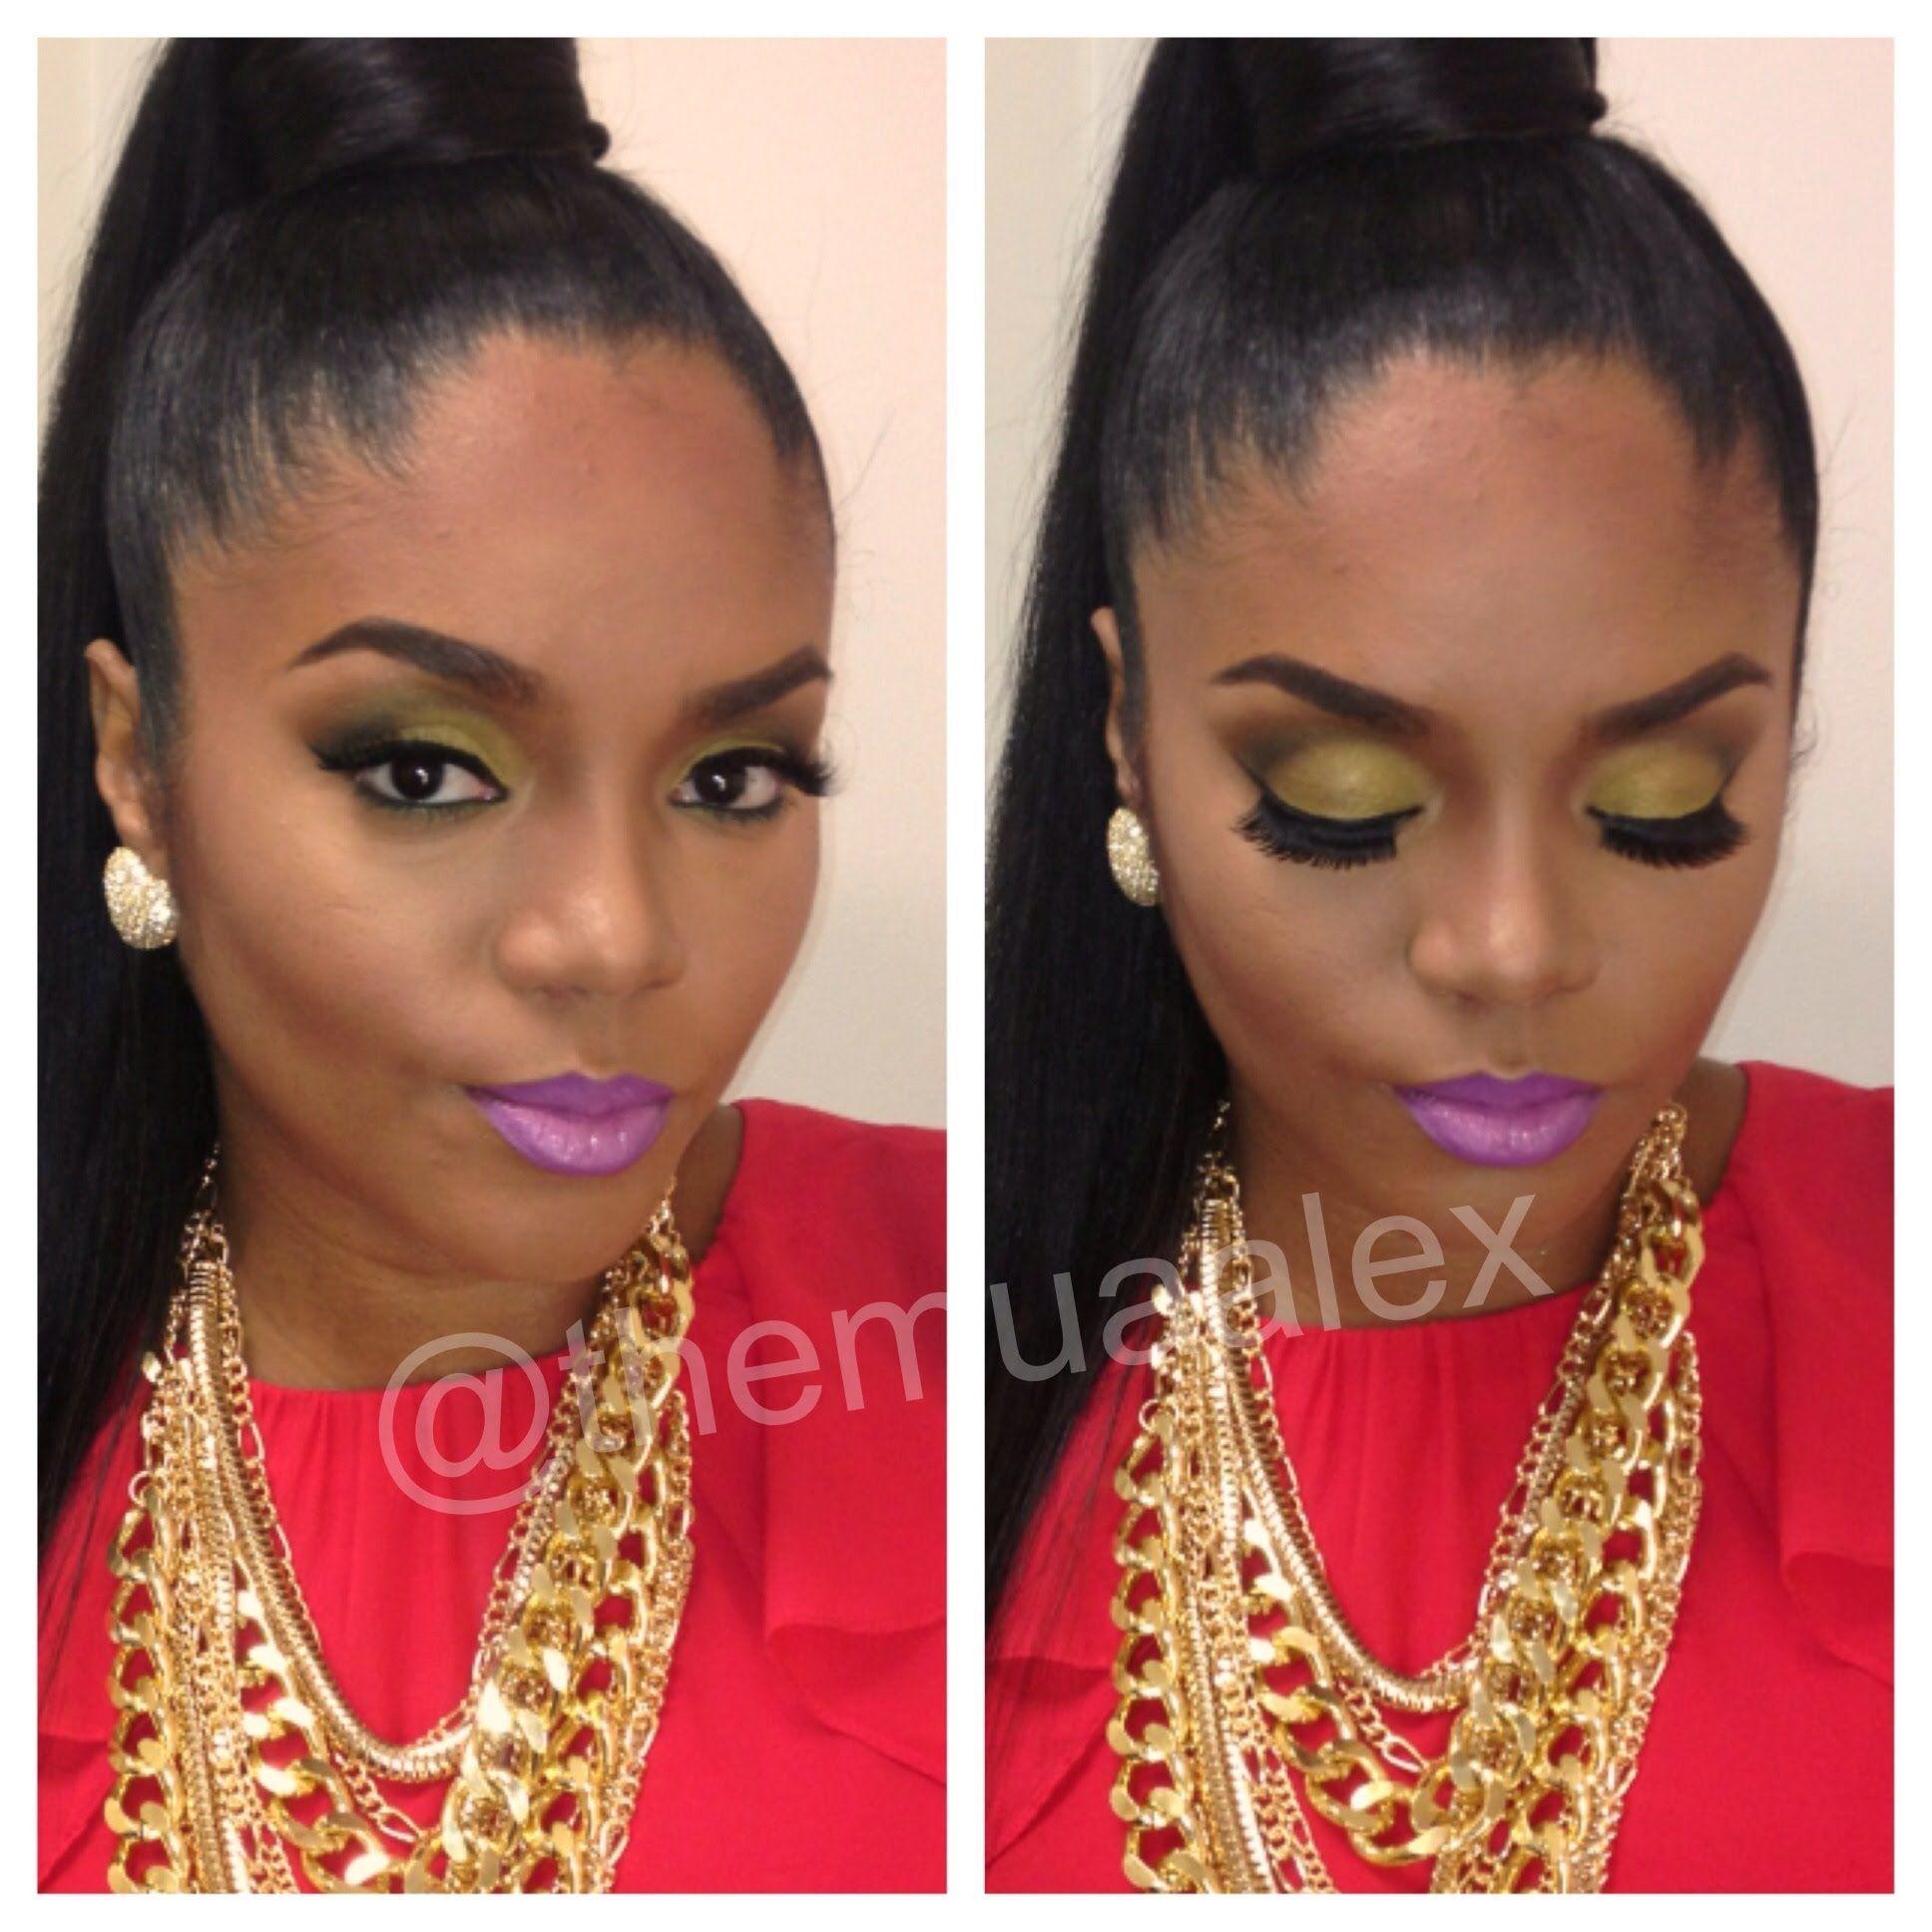 Pin By Cat On Eye Nail Makeup Genius Rasheeda Beautiful Dark Skinned Women Hip Hop Atlanta